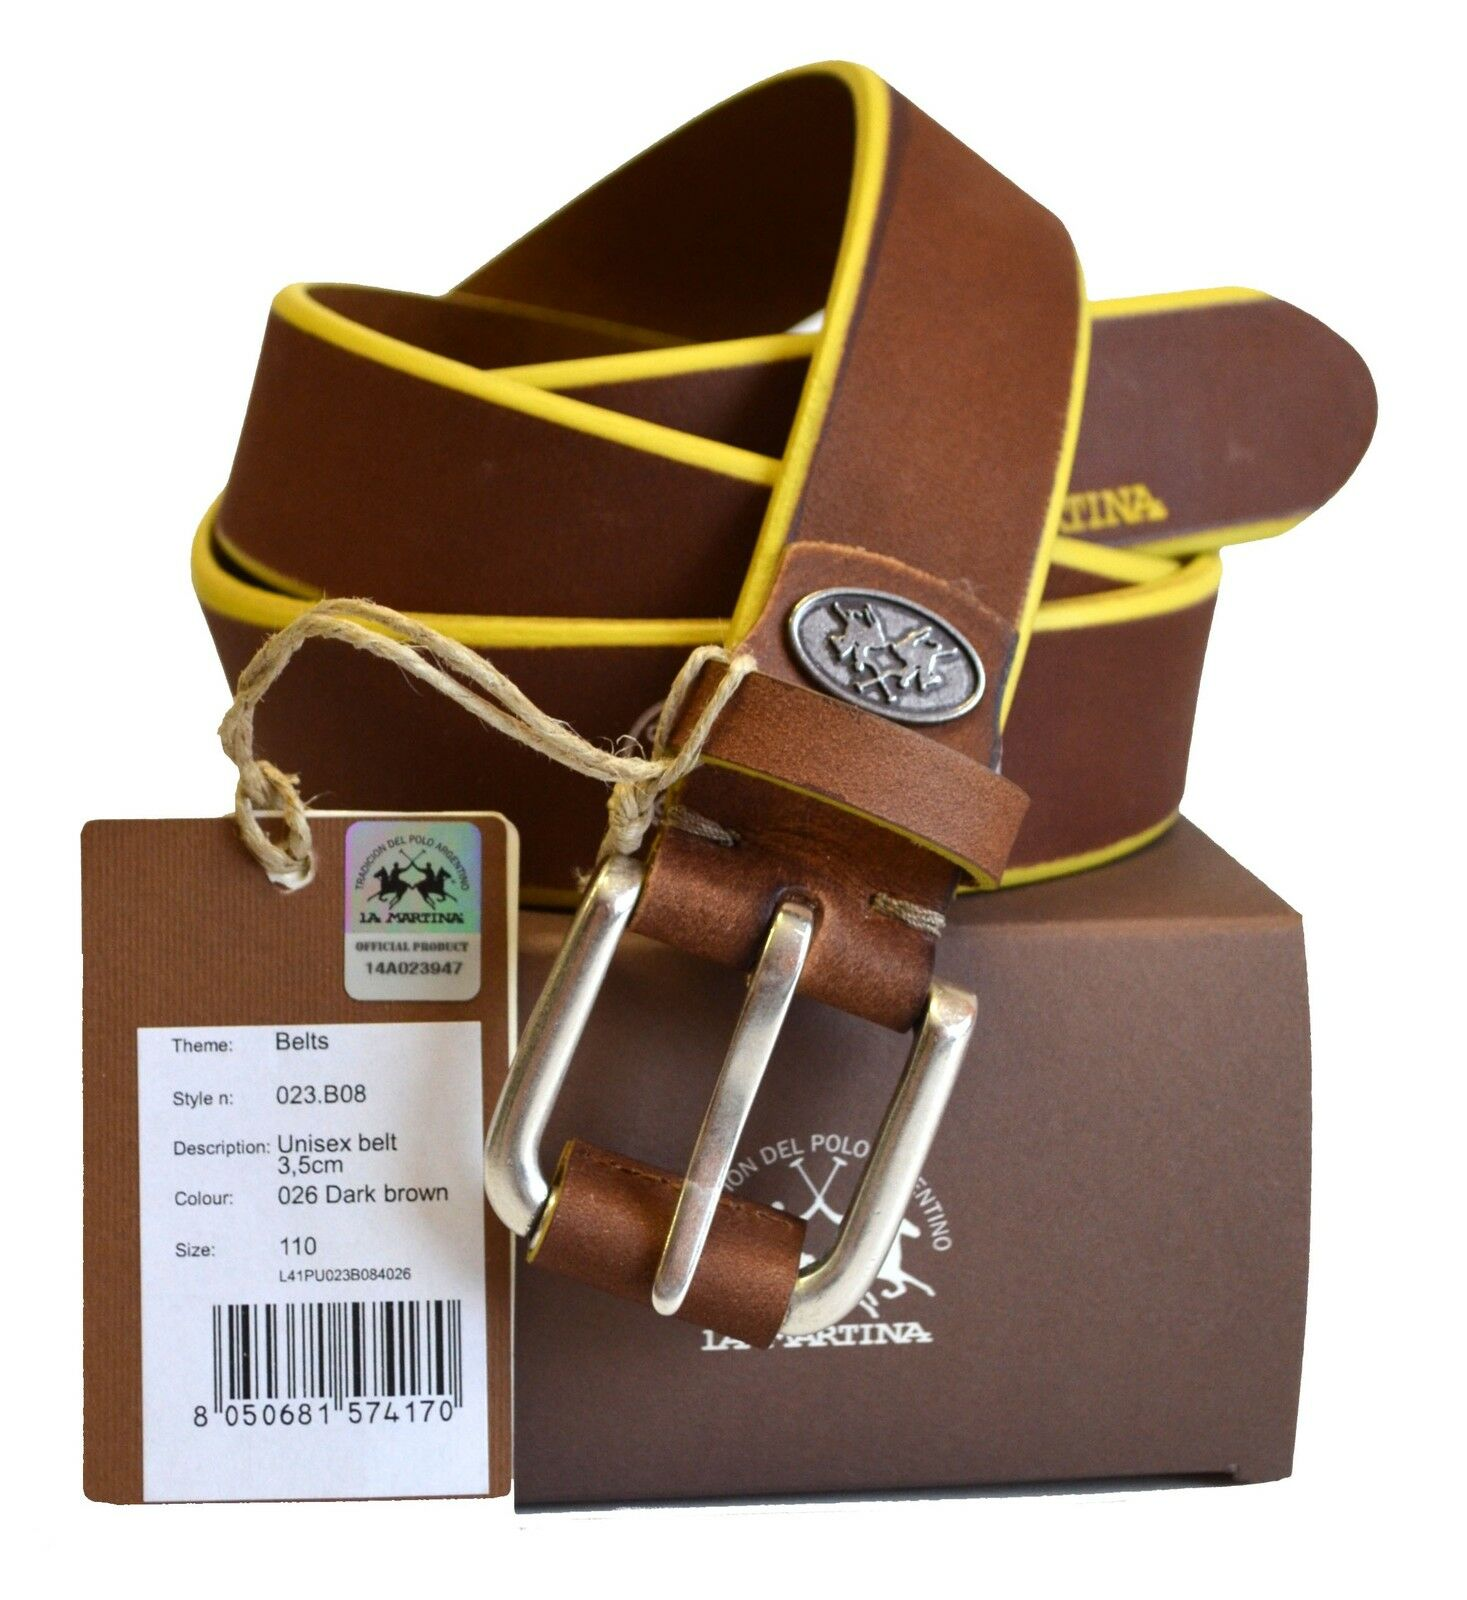 Cintura Pelle La Martina Uomo Uomo Belt Pelle 100% Leather Dark Marronee 023B08 Dimensione